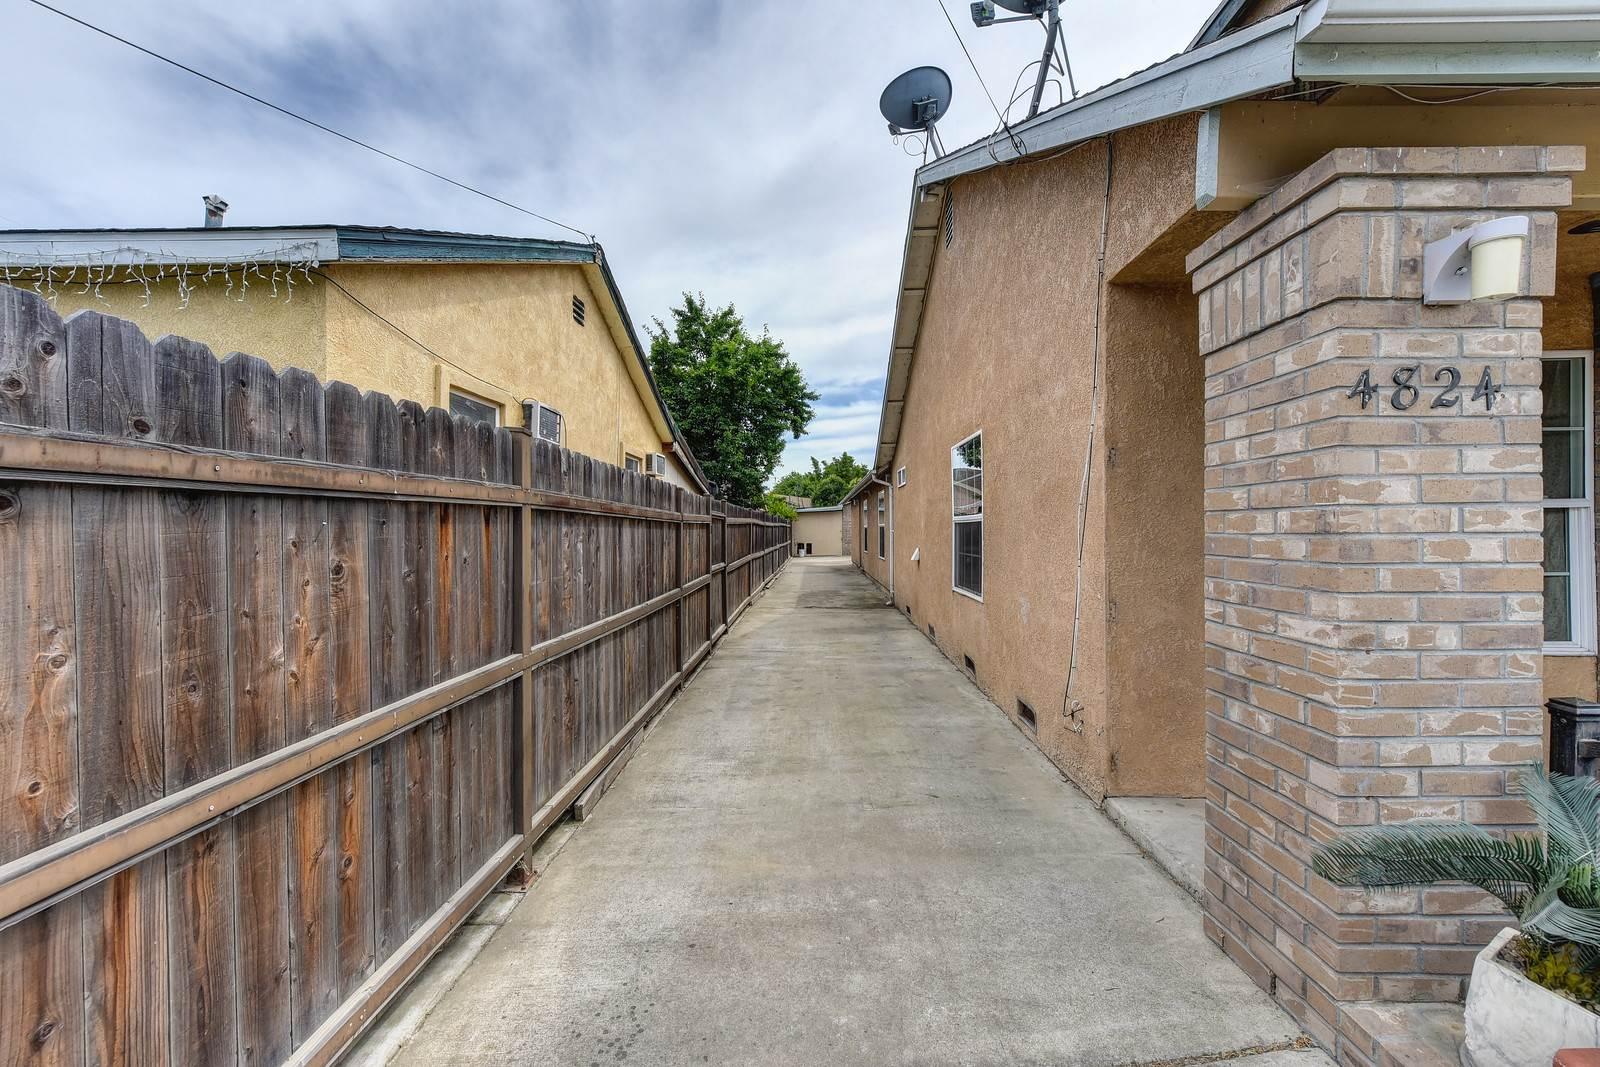 4824 Baker Ave, Sacramento, CA 95820